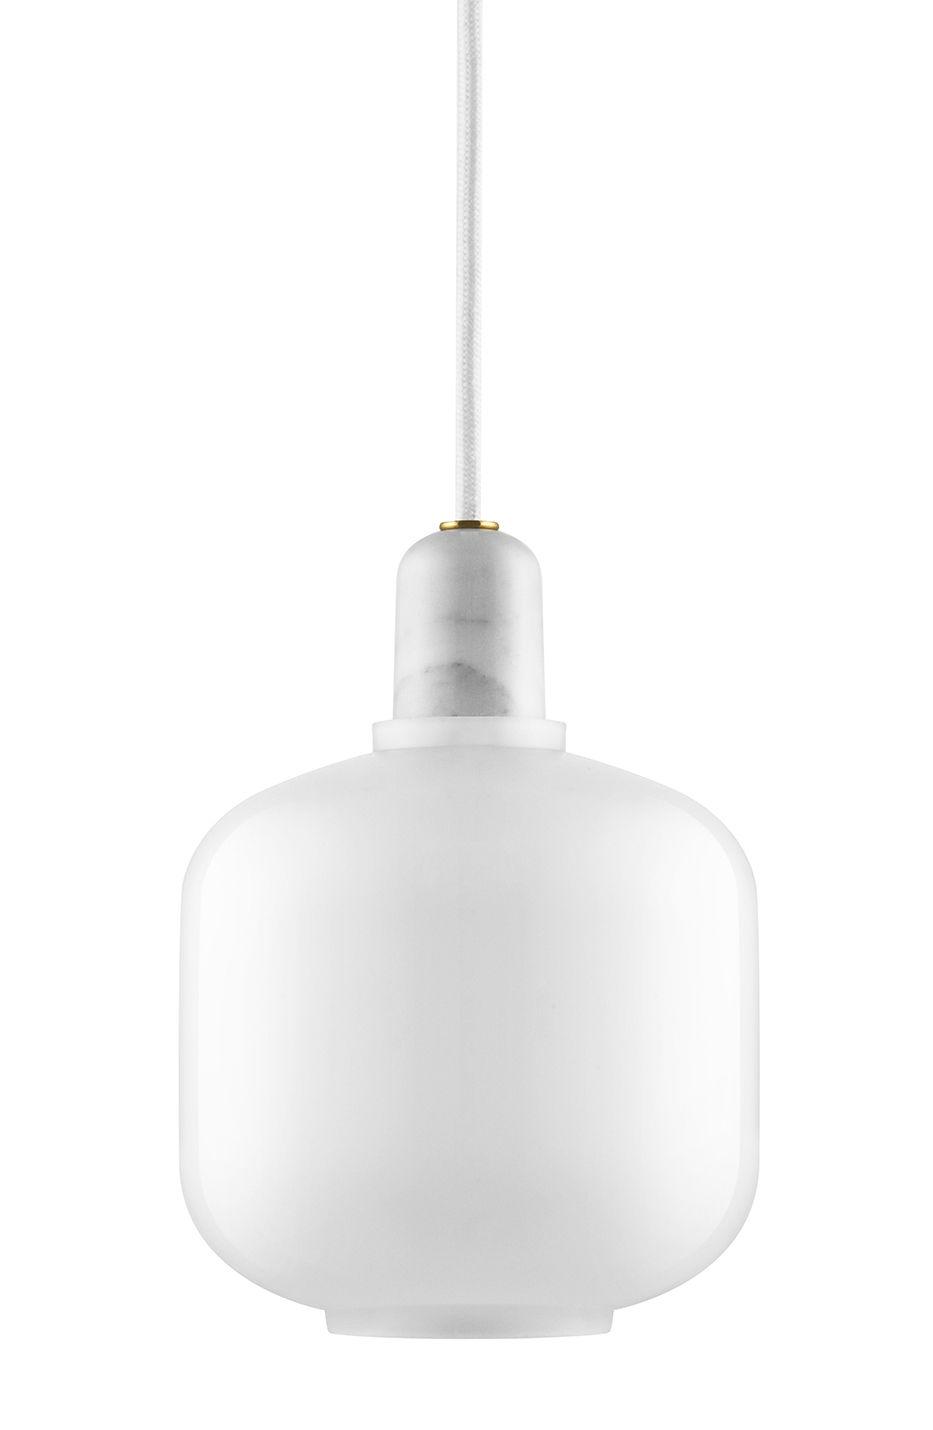 Leuchten - Pendelleuchten - Amp Small Pendelleuchte / Ø 14 cm x H 17 cm - Glas & Marmor - Normann Copenhagen - Weiß / Marmor weiß - Glas, Marmor